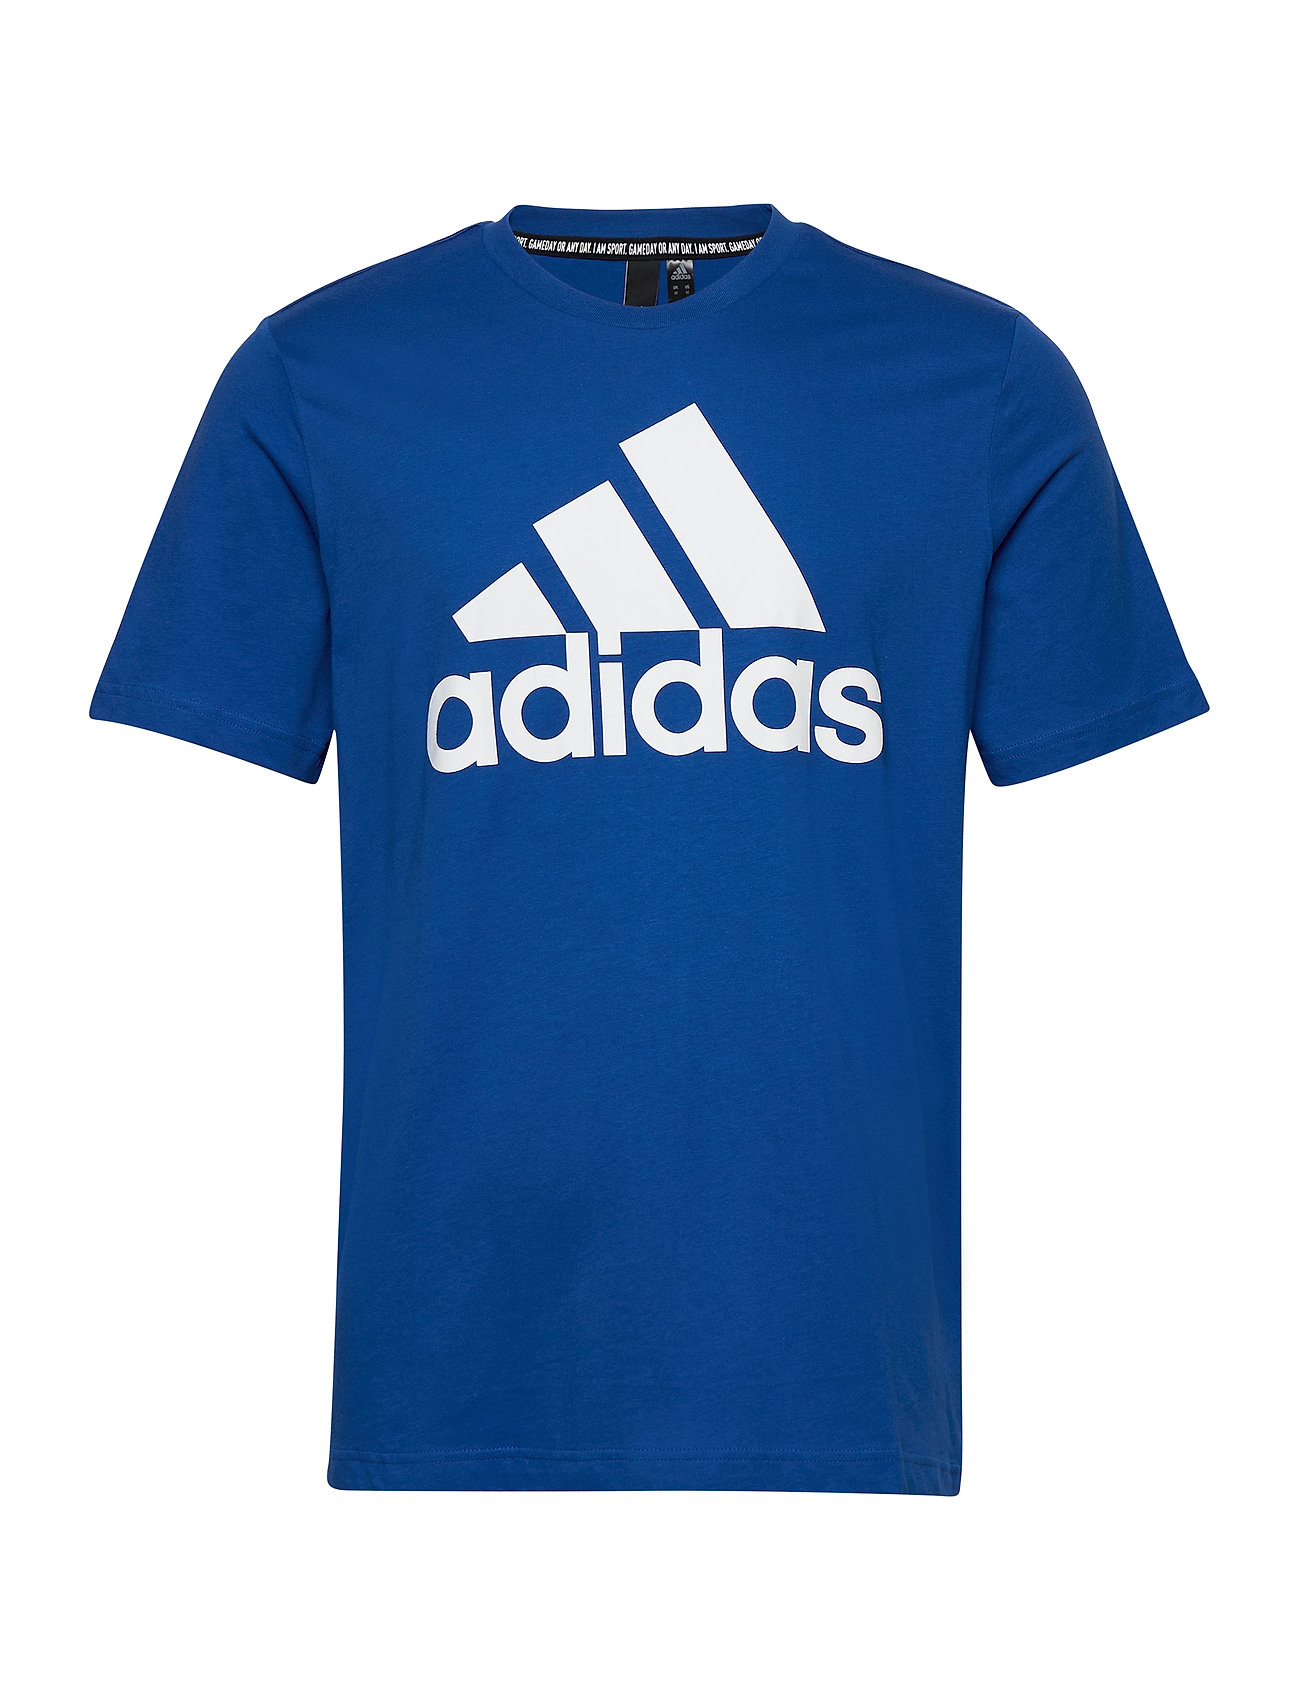 Image of Mh Bos Tee T-shirt Blå Adidas Performance (3431377057)